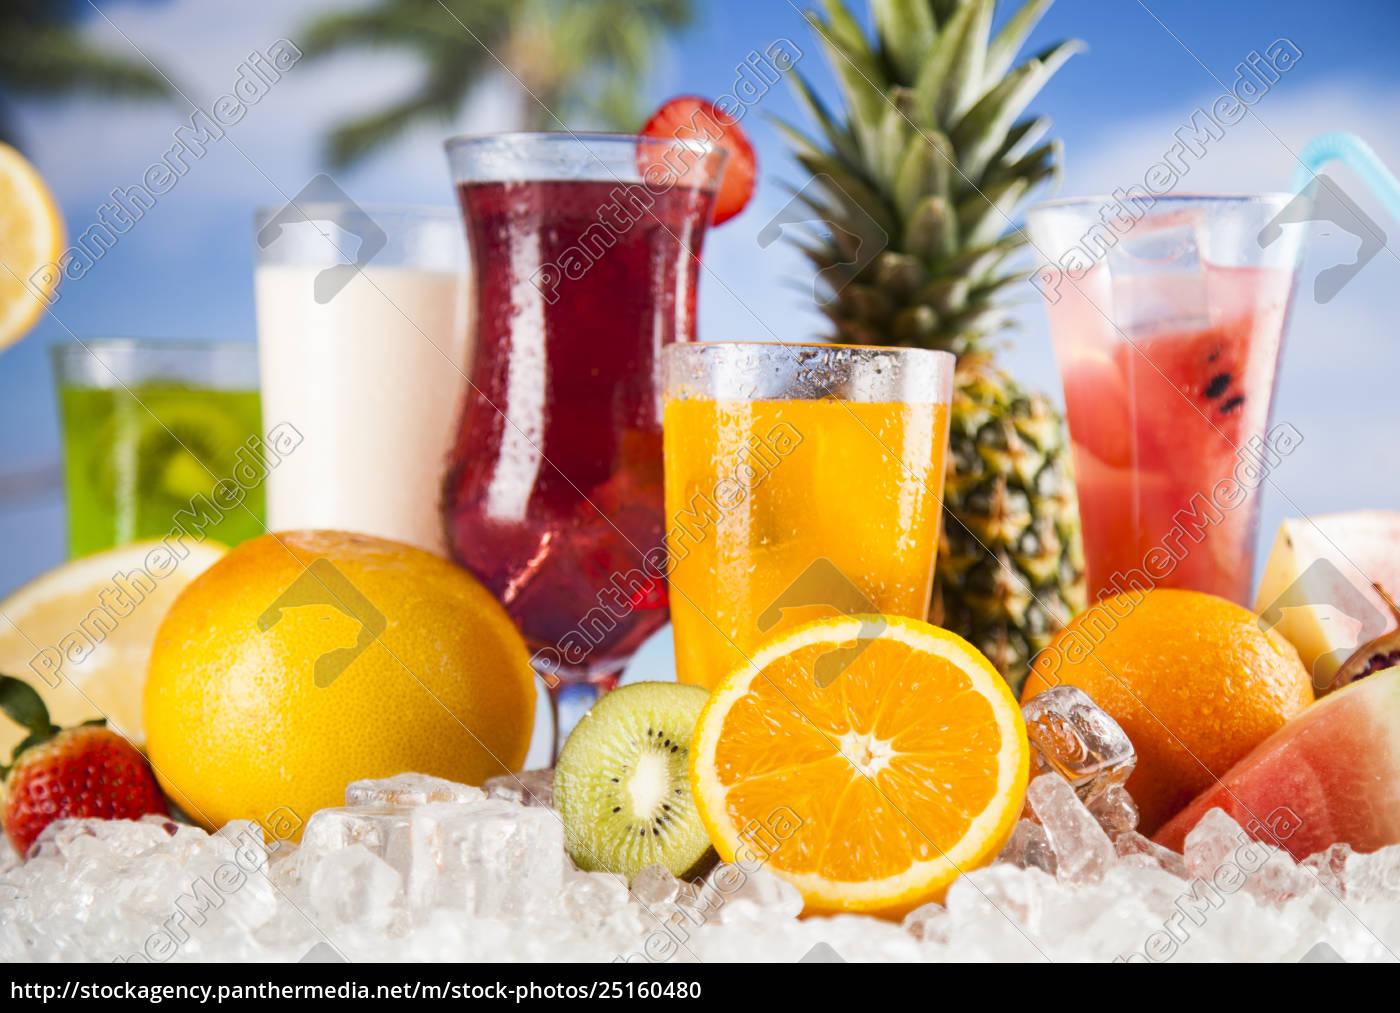 exotic, summer, drinks - 25160480